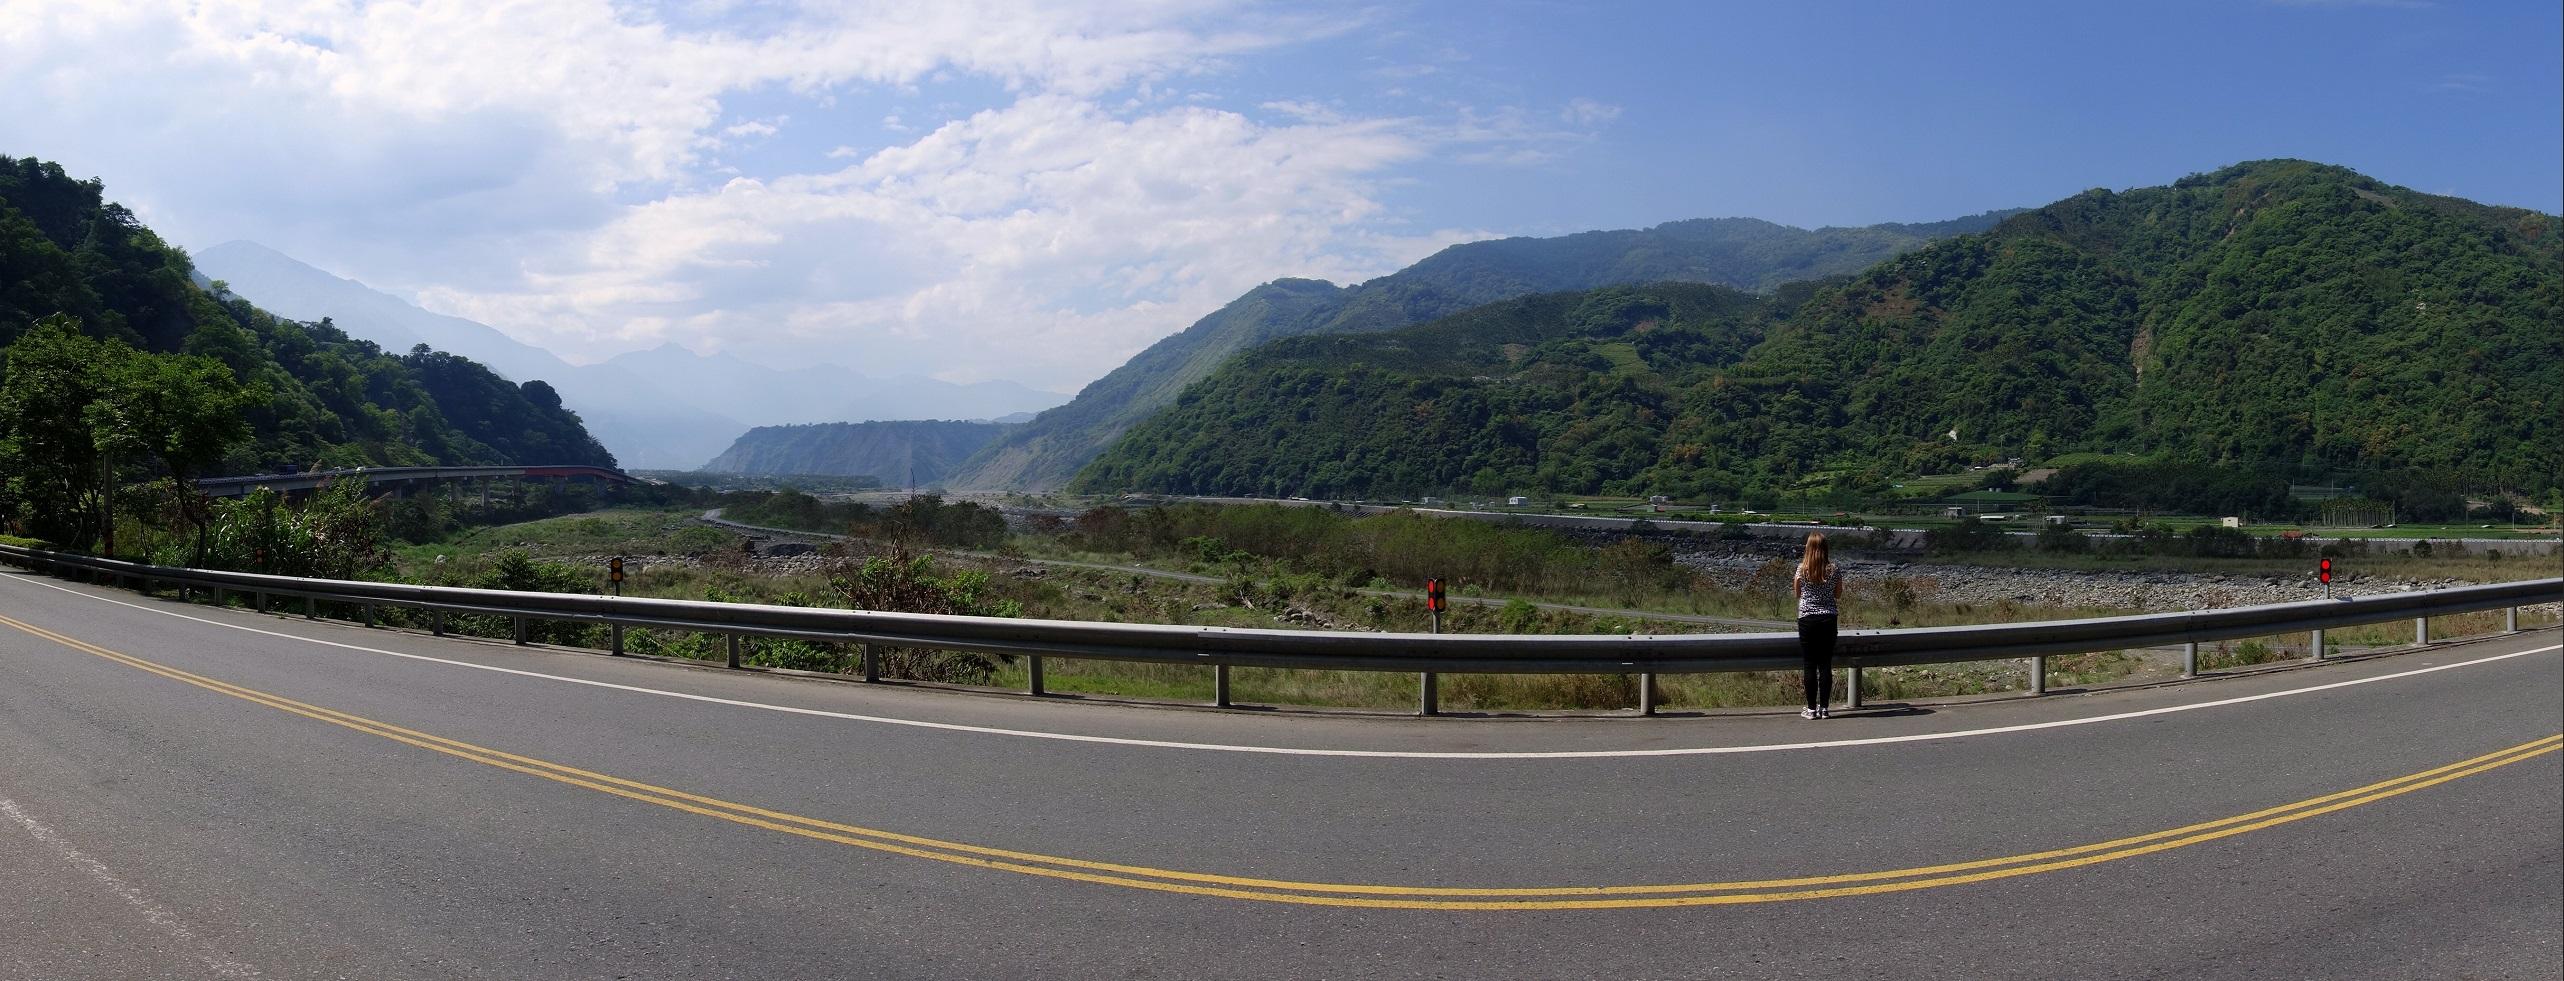 Piękna sceneria dróg na Tajwanie